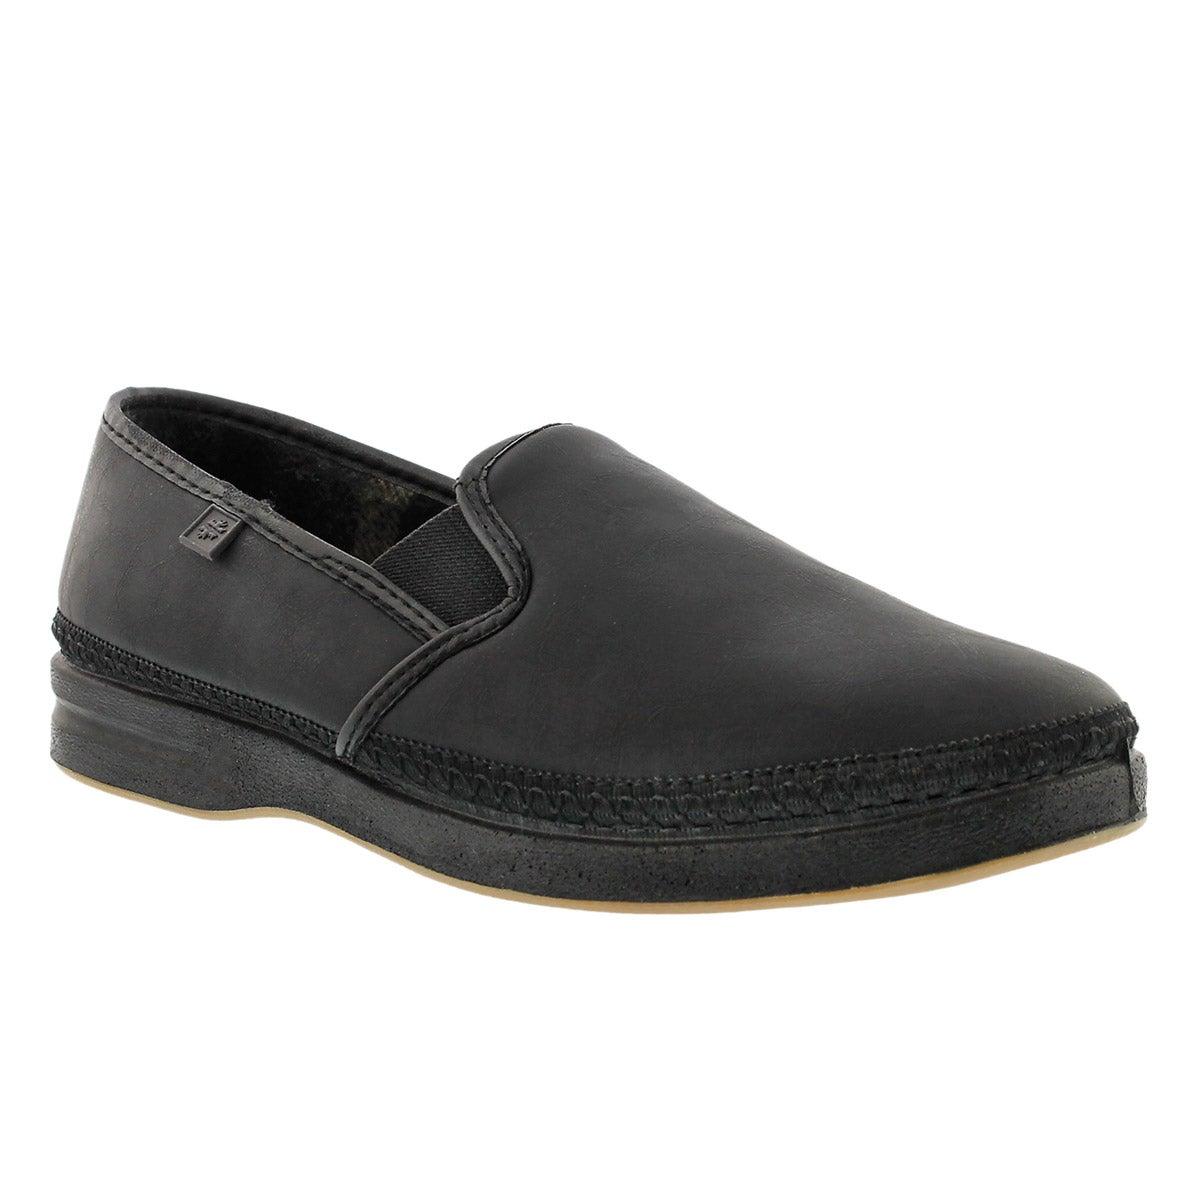 Mns Davenport black closed back slipper